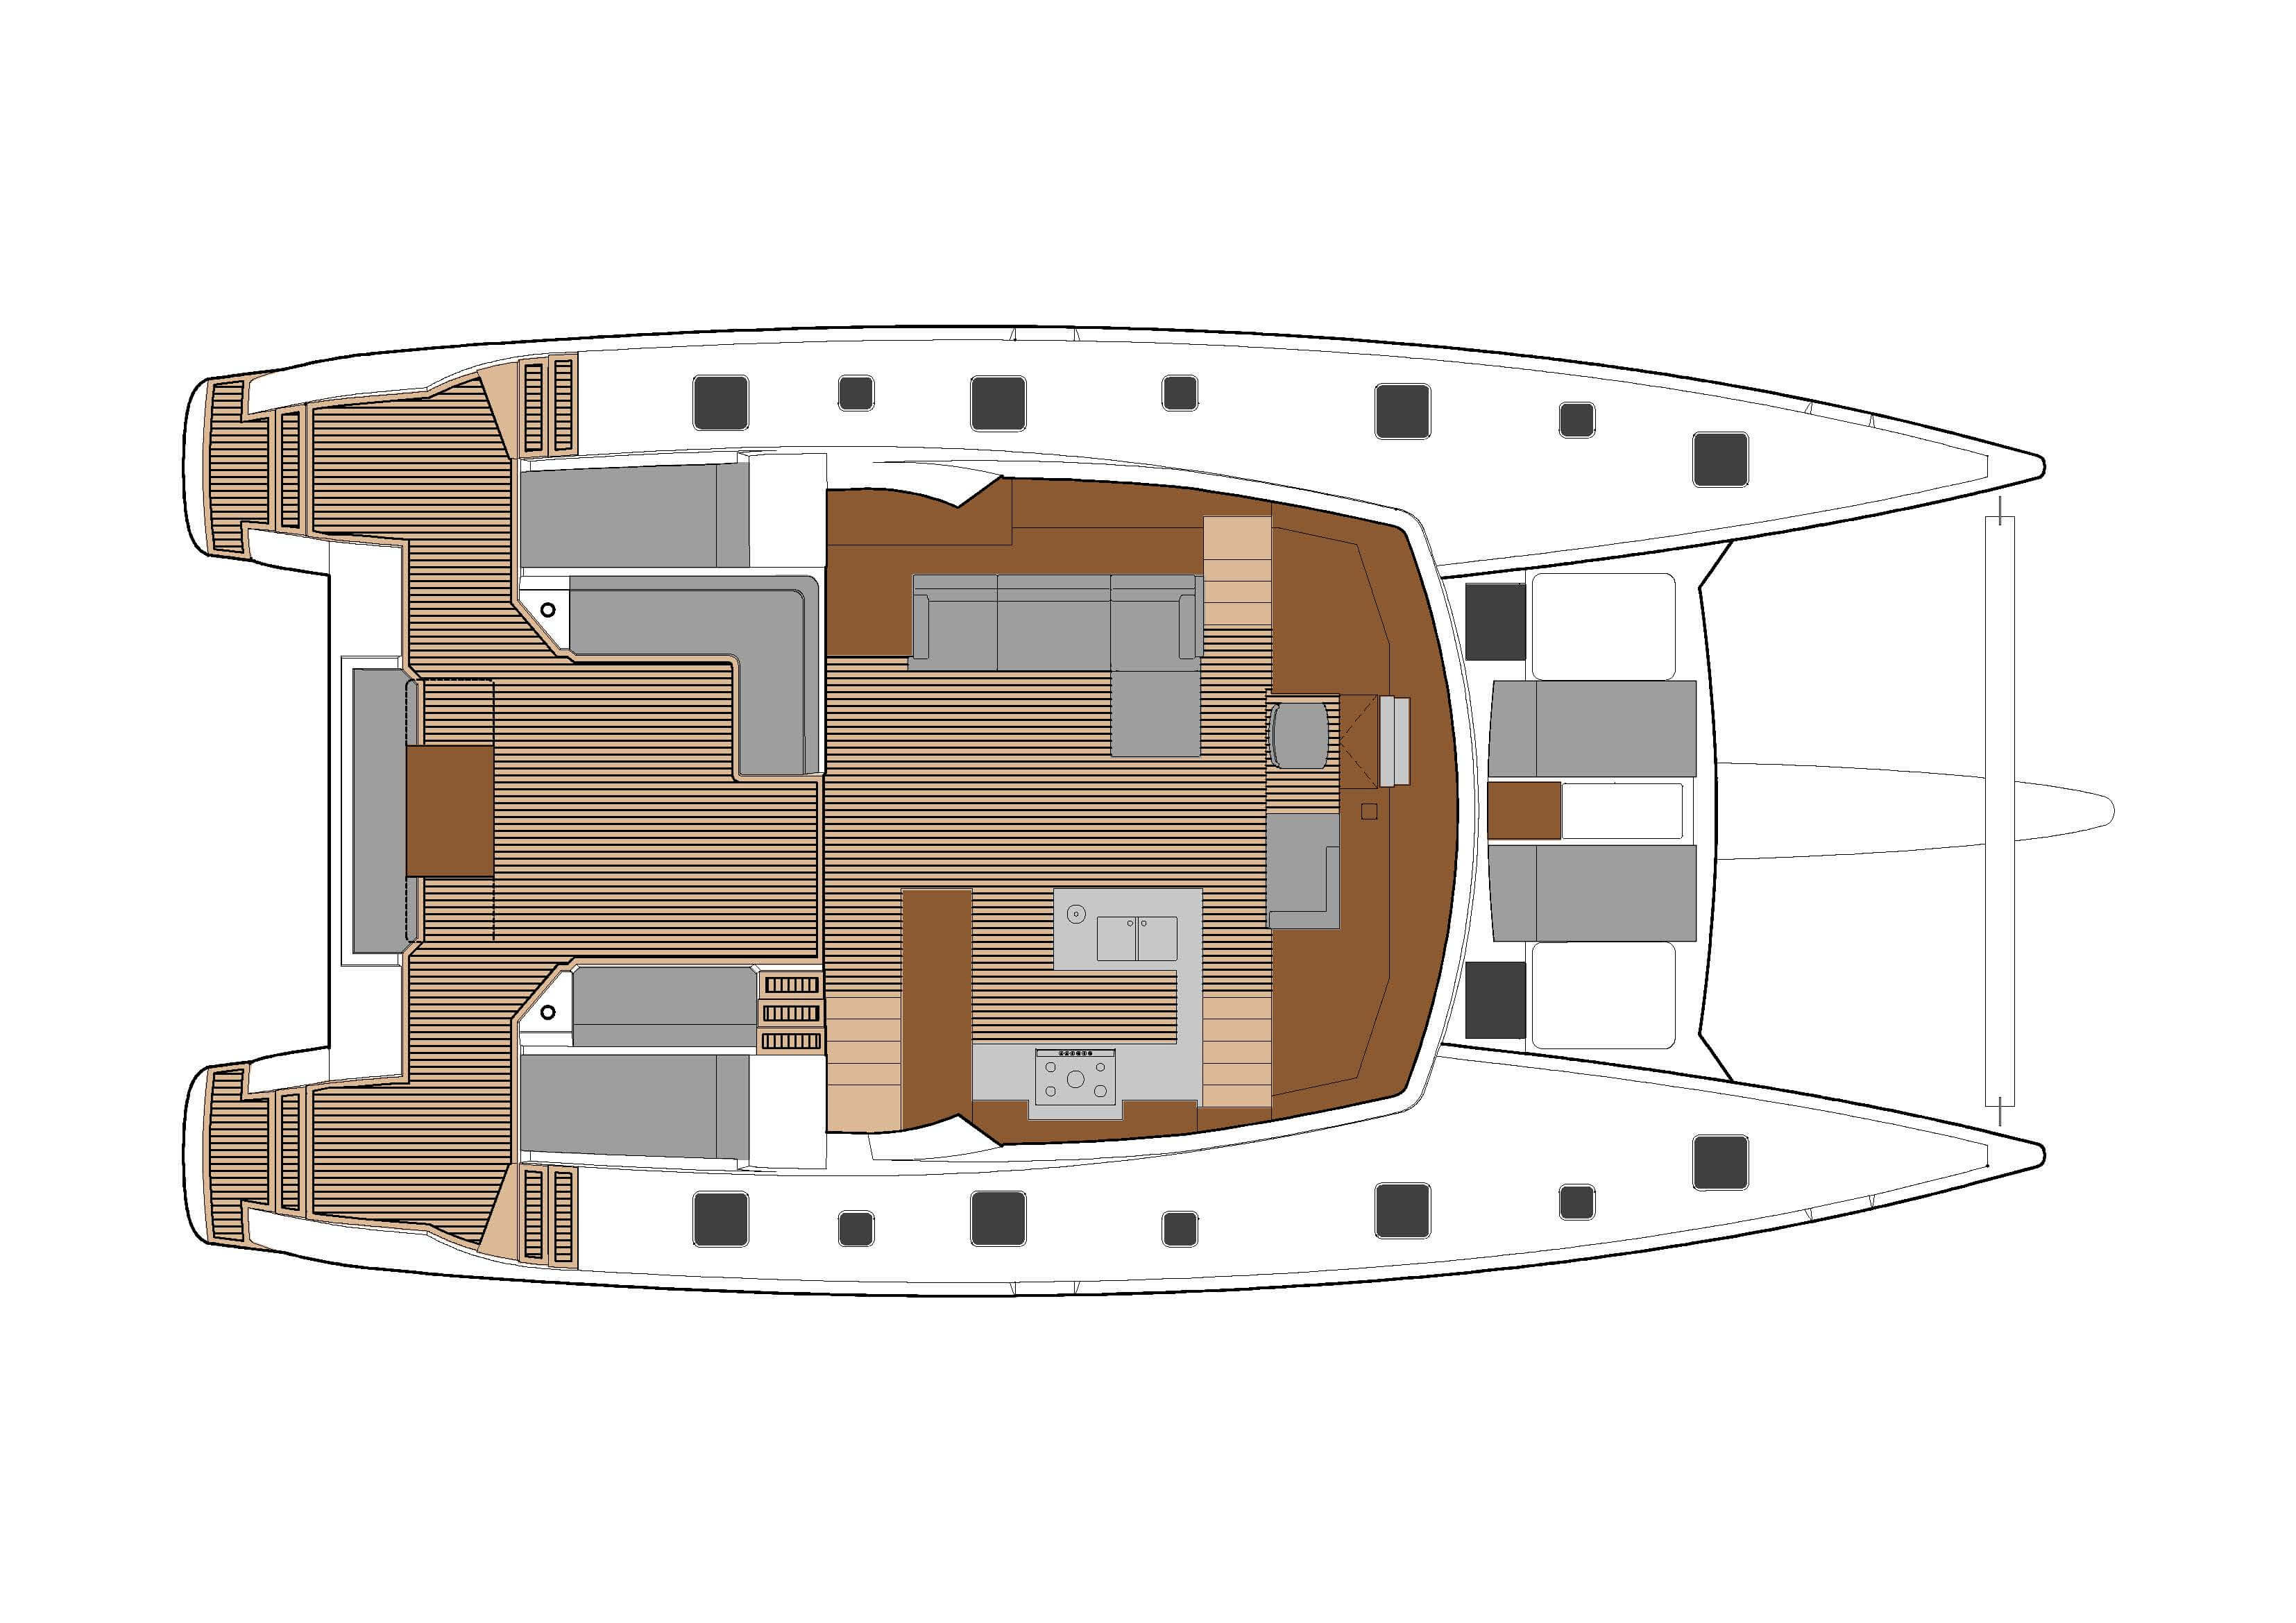 ip58-2-layout